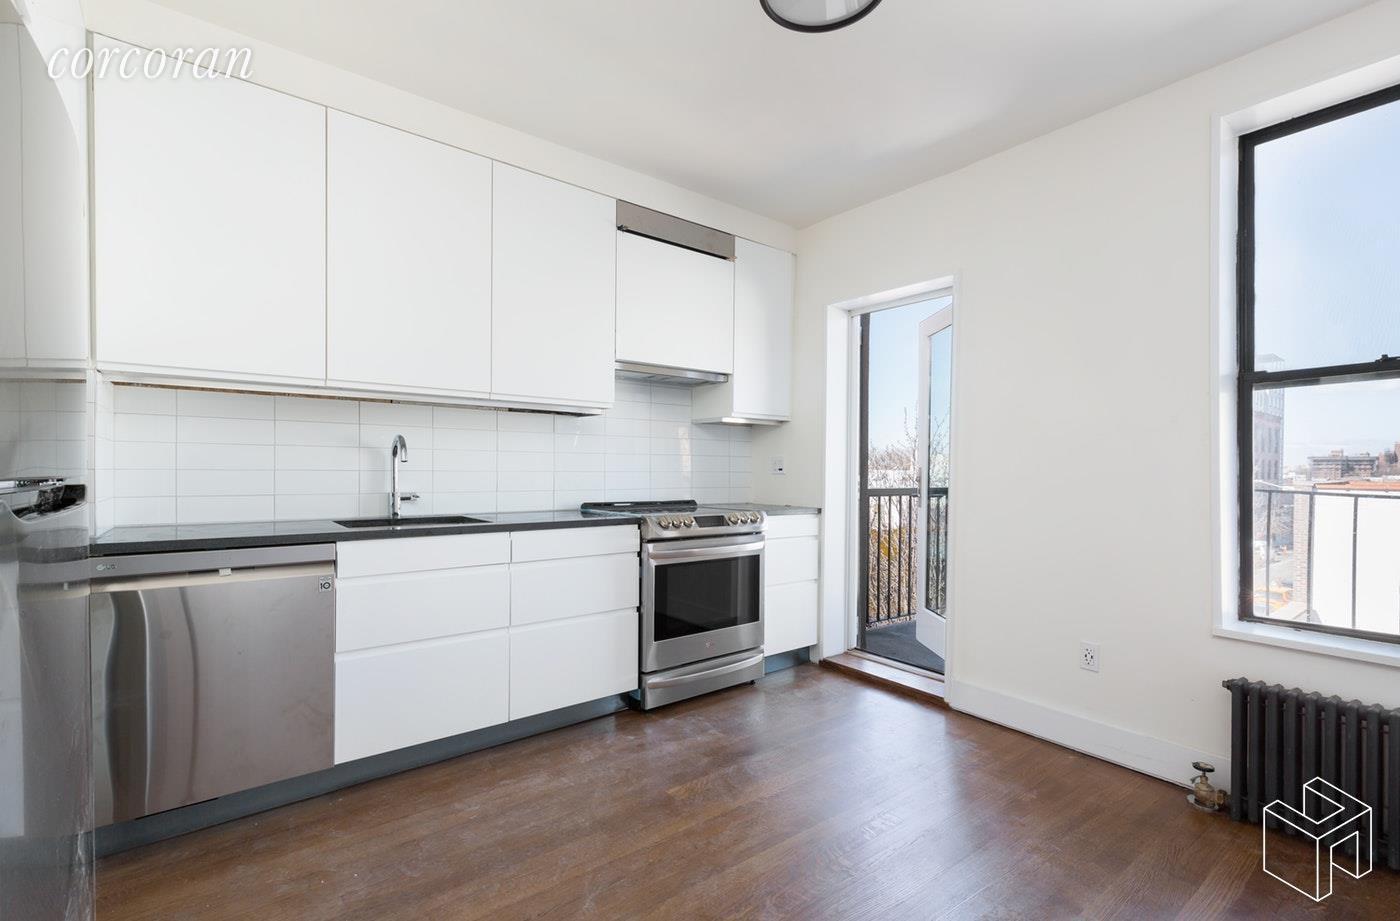 Ad Rental Apartment Brooklyn (11217) ref:5803279